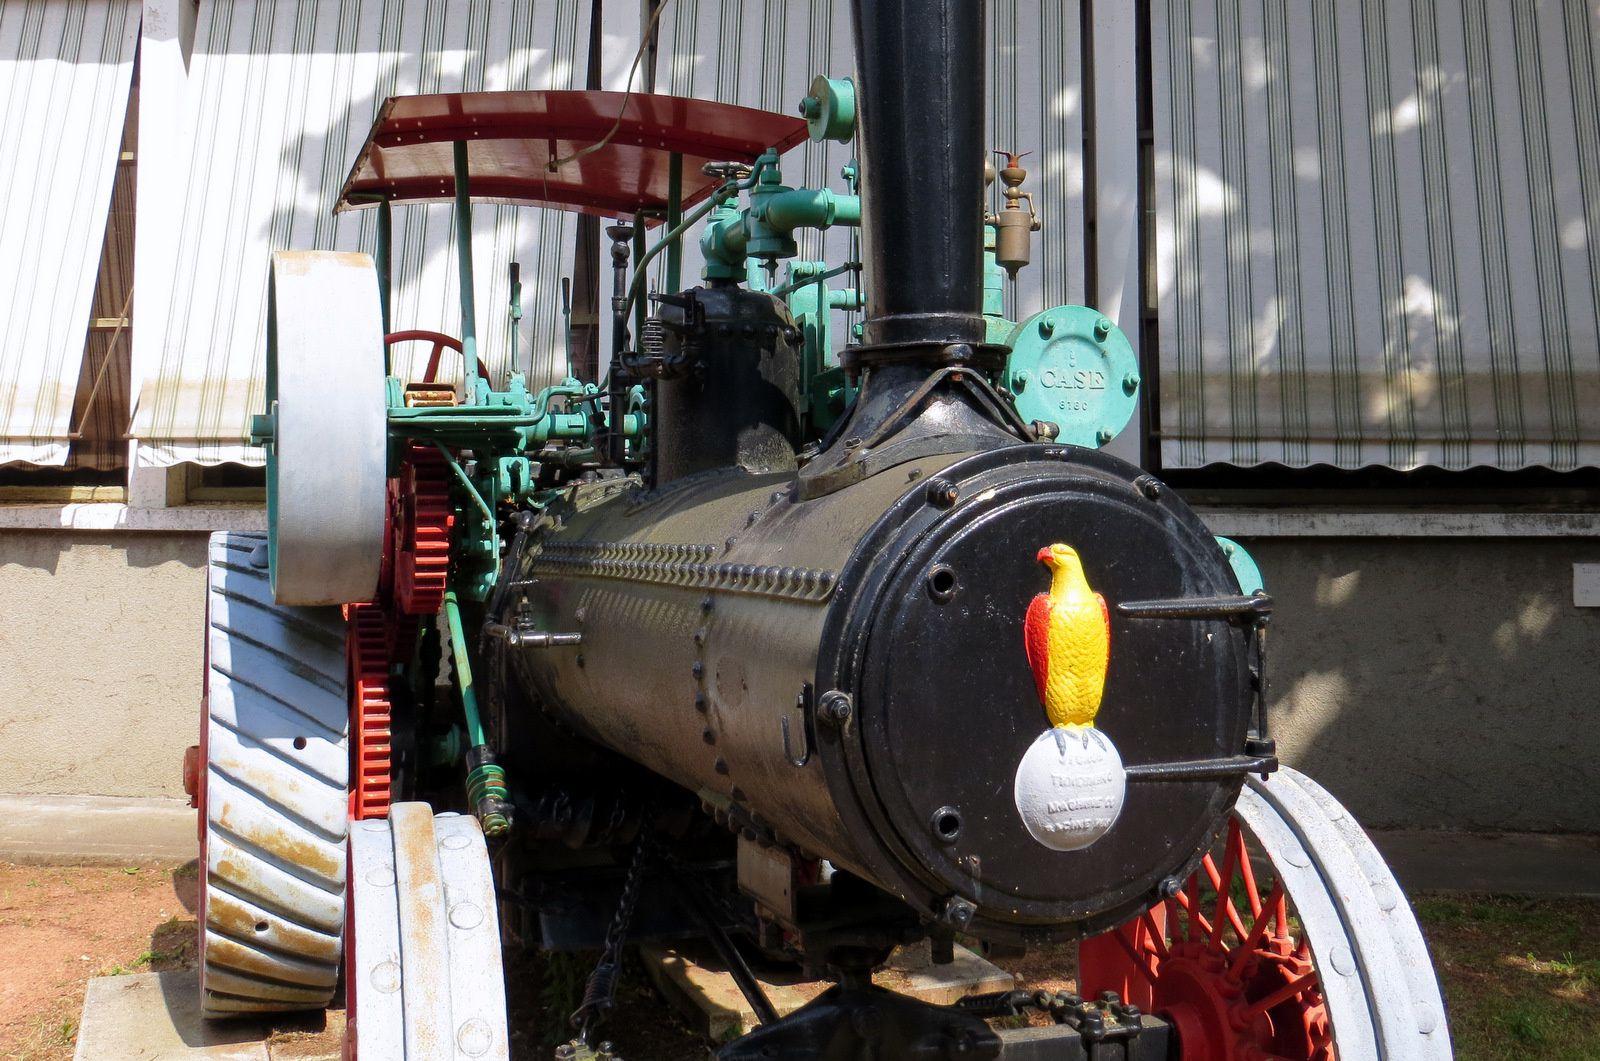 C.A.S.E, locomobile routière de marque américaine